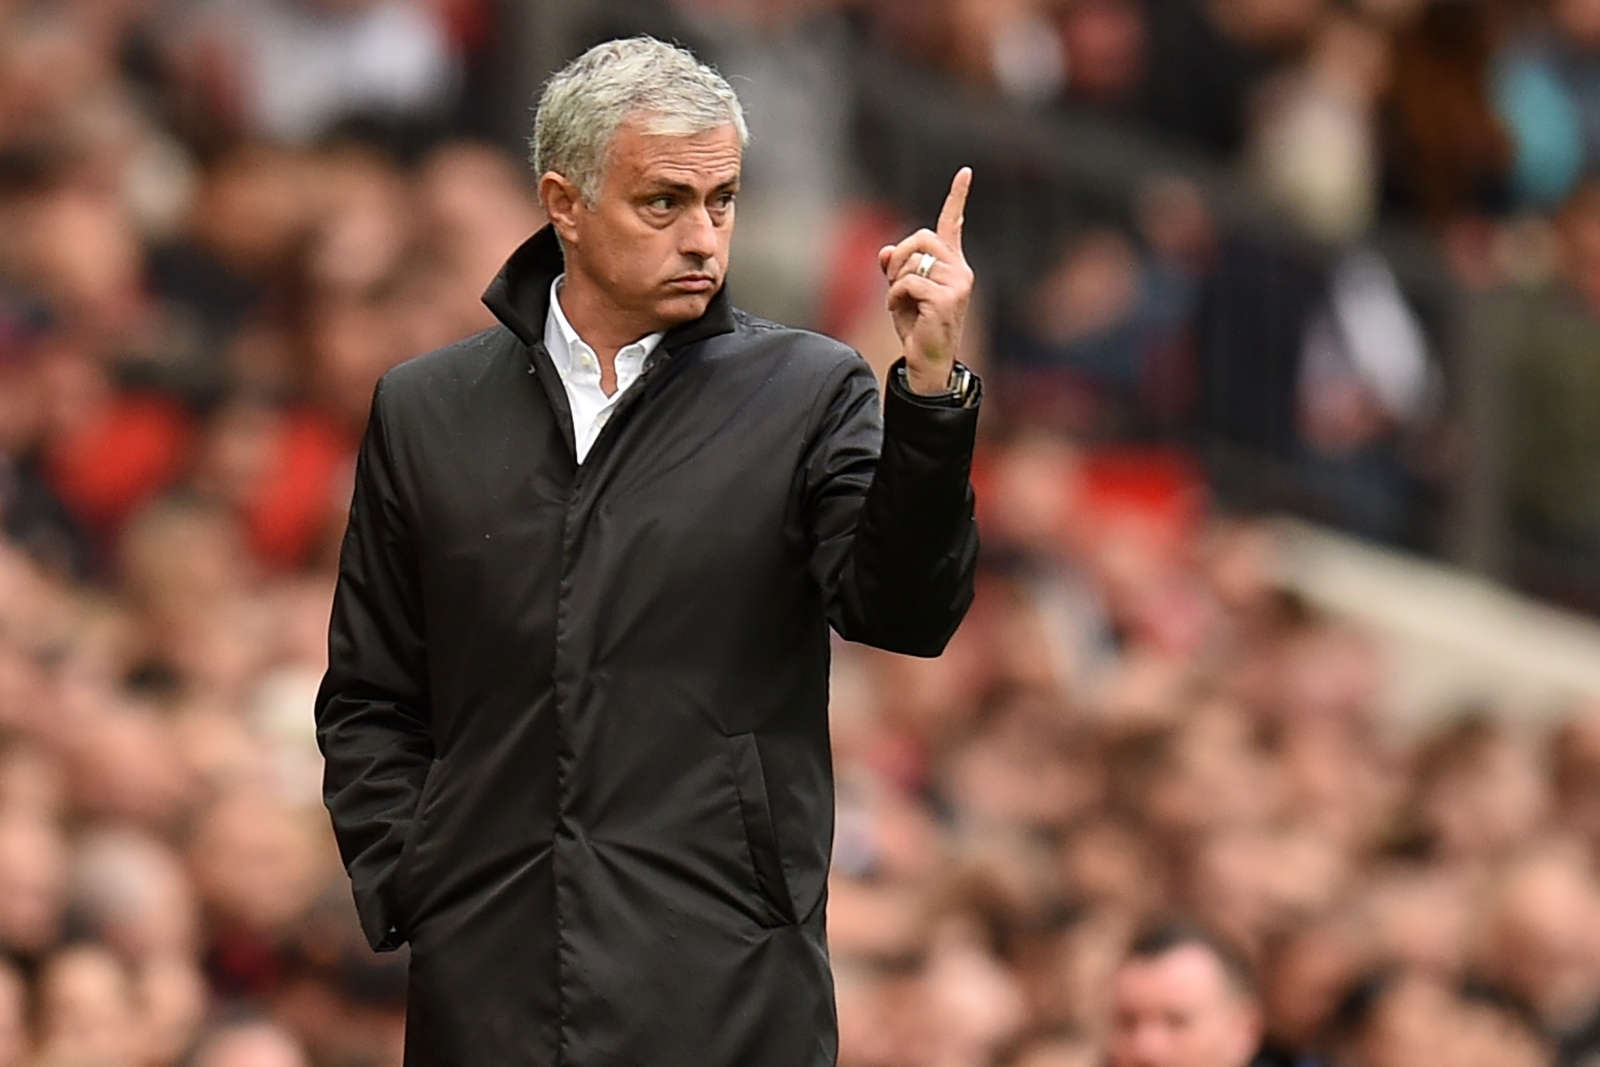 Manchester United defender Luke Shaw could make his comeback against Burton Albion